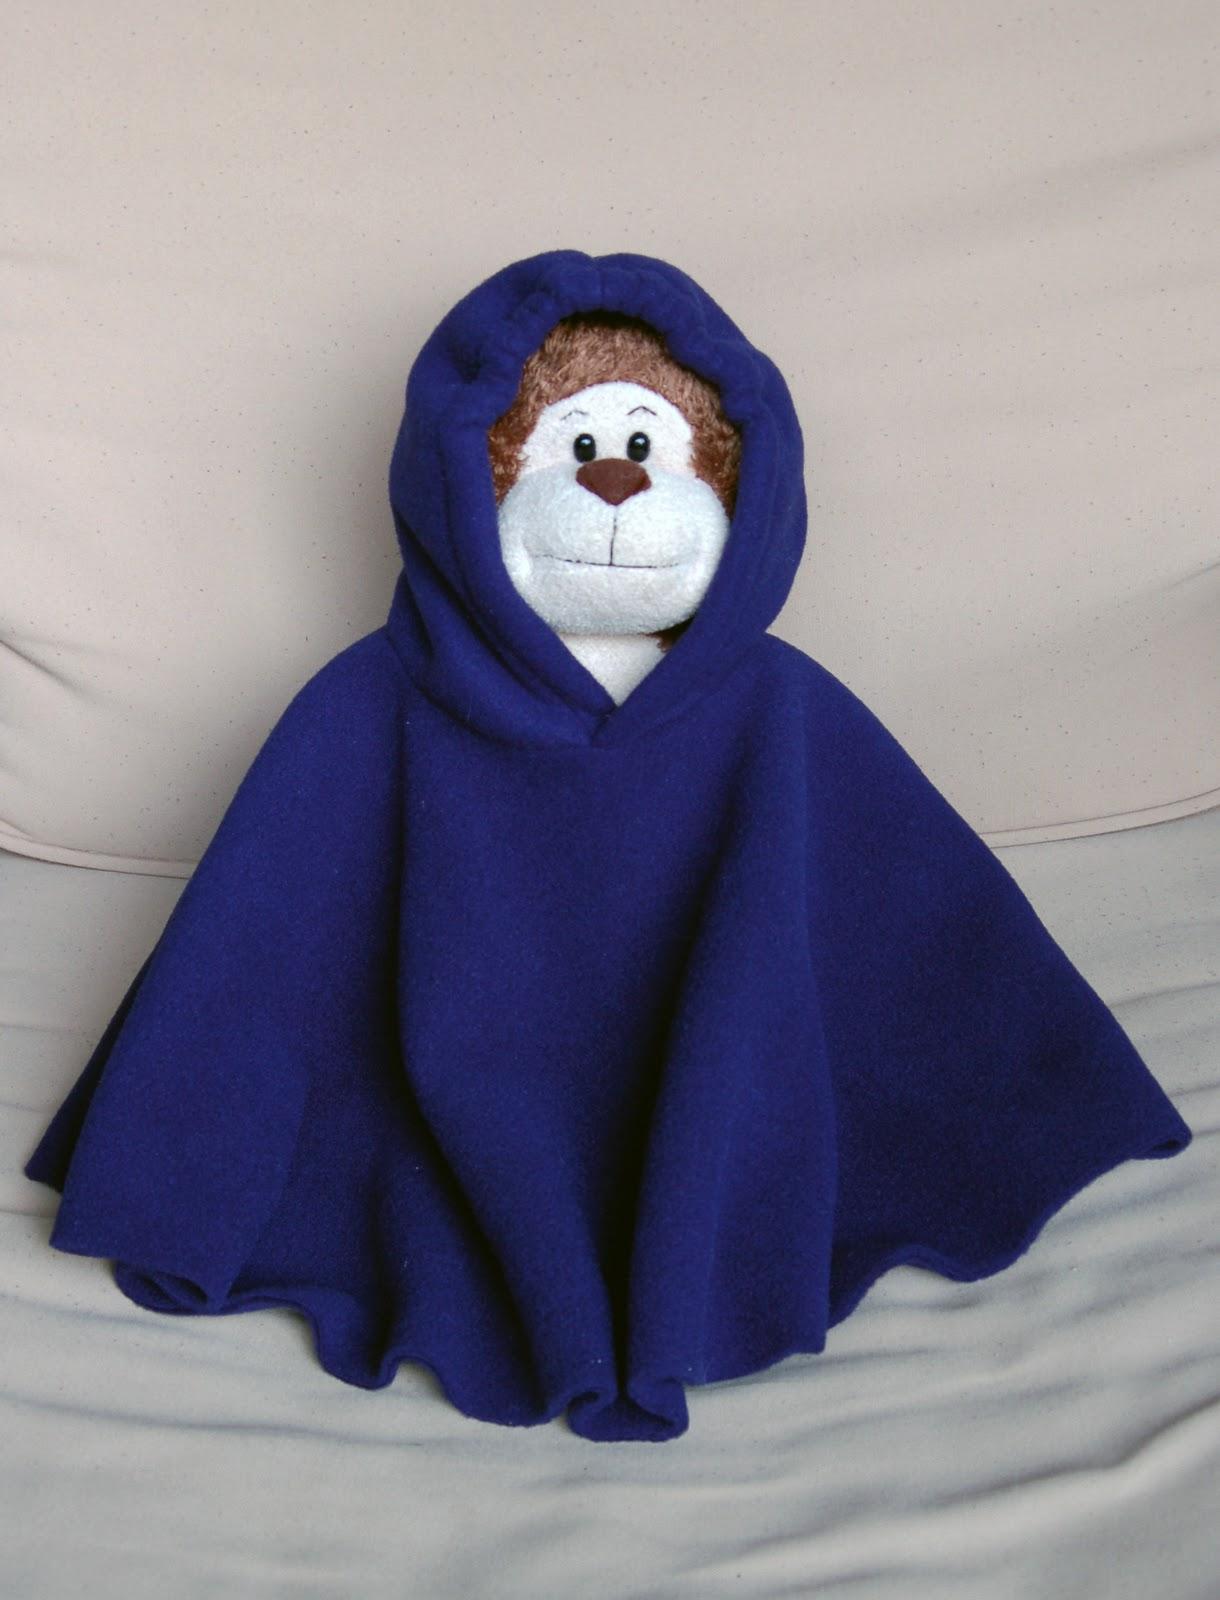 Sarah Jane Sews: Fleece Poncho for L.